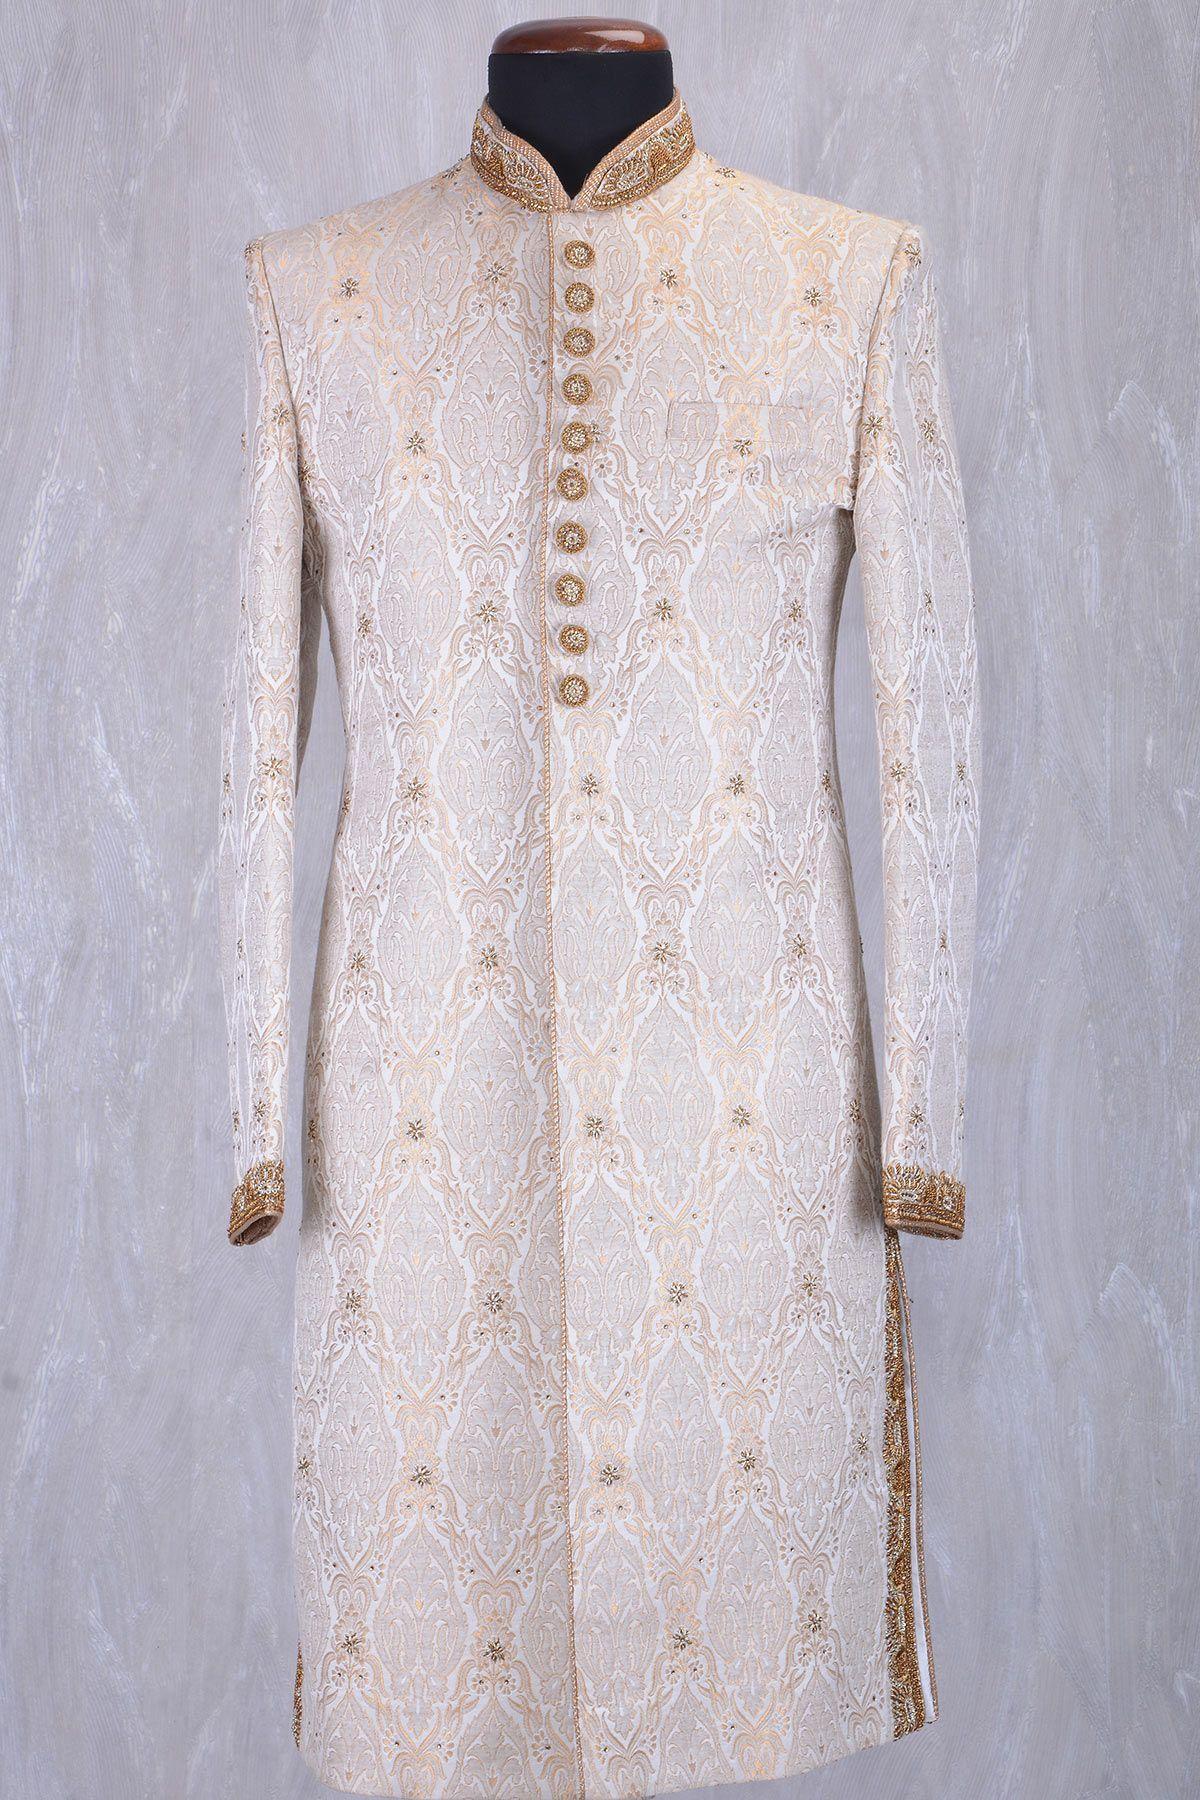 85c0d7a461 Off White & Gold Brocade Zardosi Embroidered Wedding Sherwani-SH397